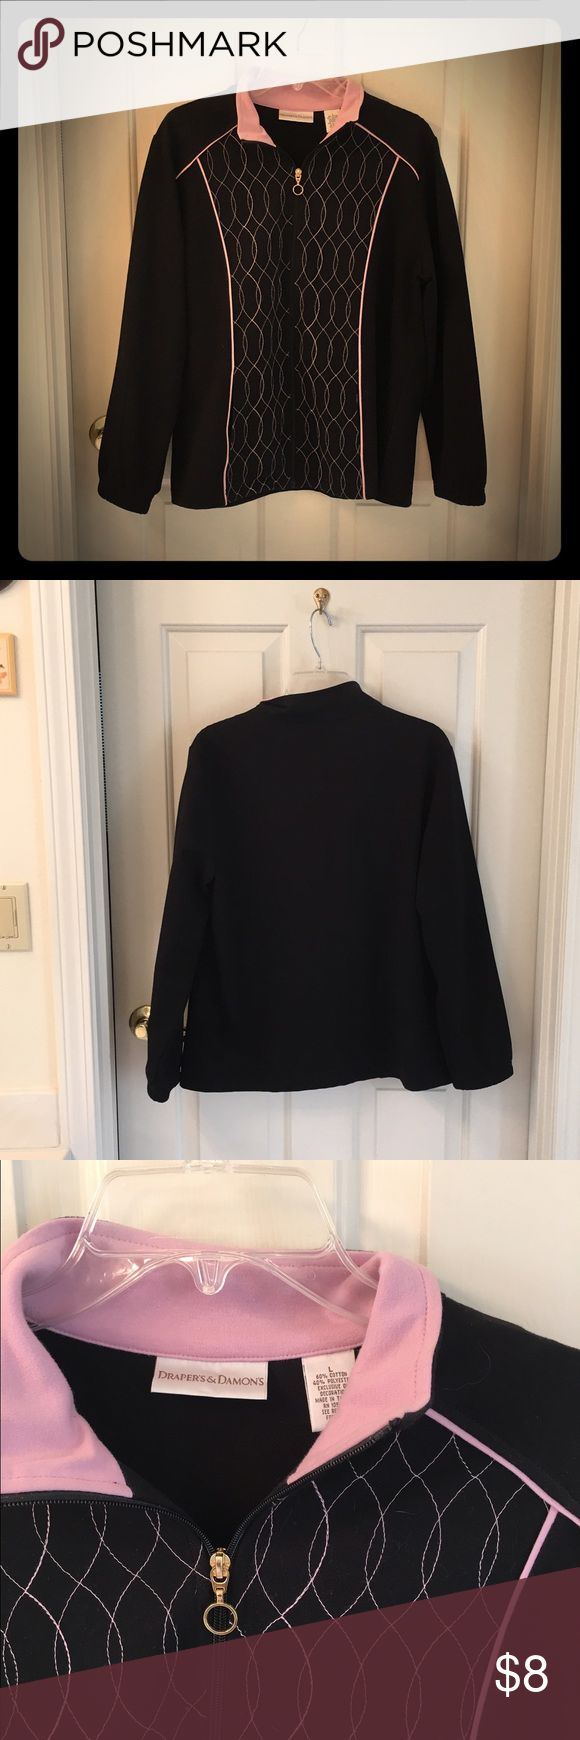 Beautiful Zip Up Sweater Zip up sweater, beautiful pattern, like new, size L Drapers & Demons Sweaters Cardigans